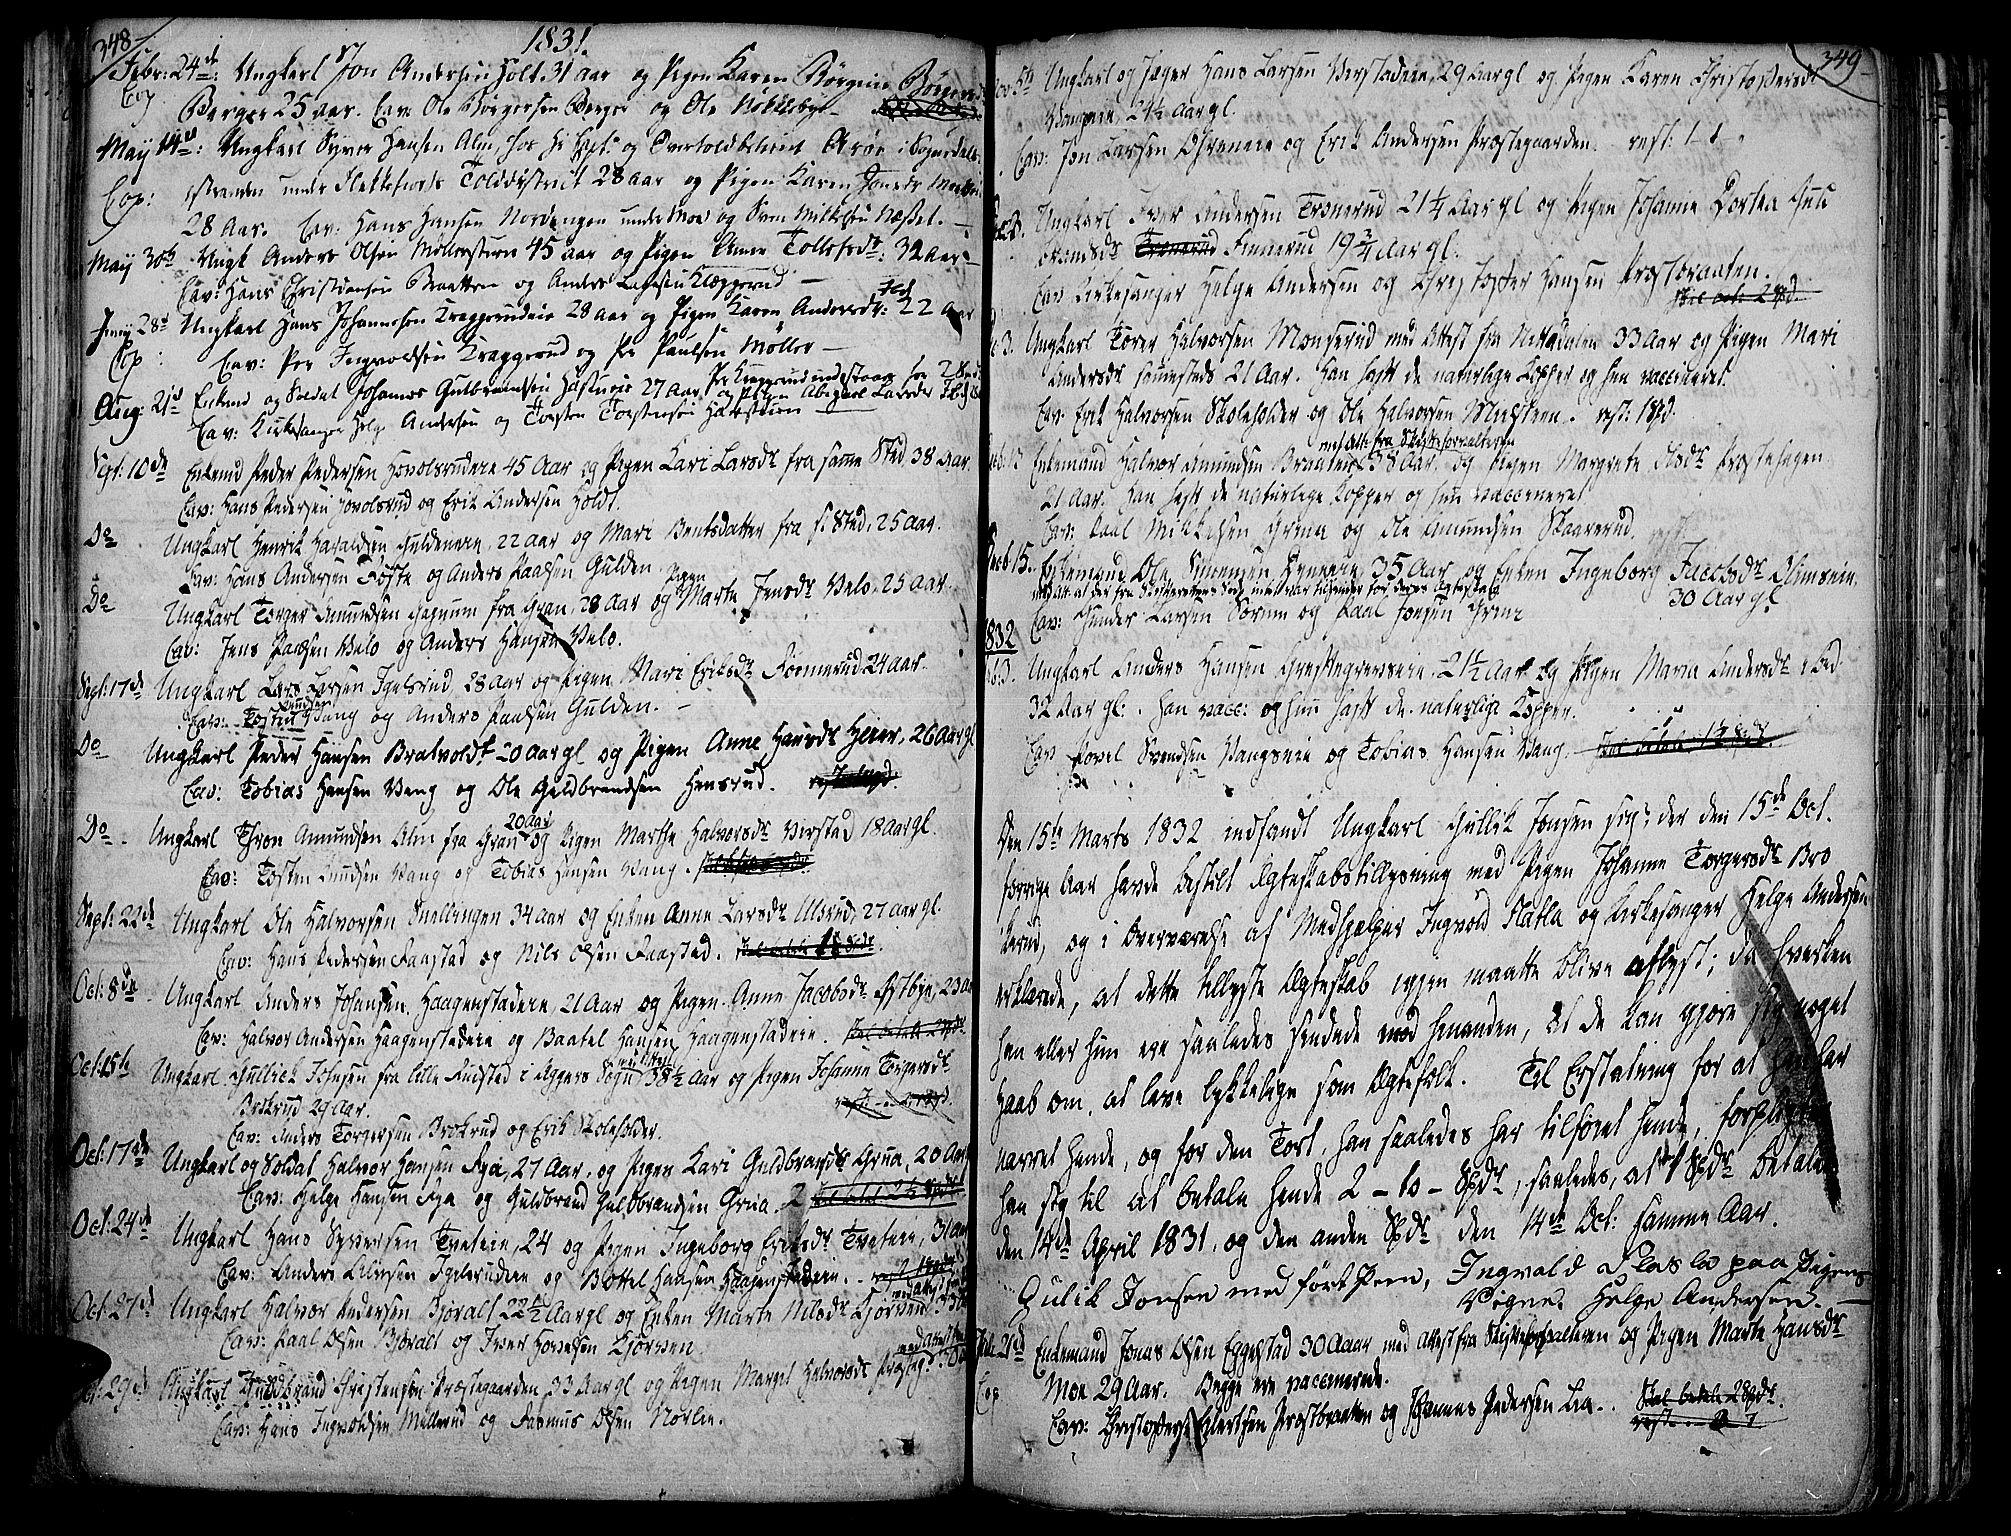 SAH, Jevnaker prestekontor, Ministerialbok nr. 4, 1800-1861, s. 348-349